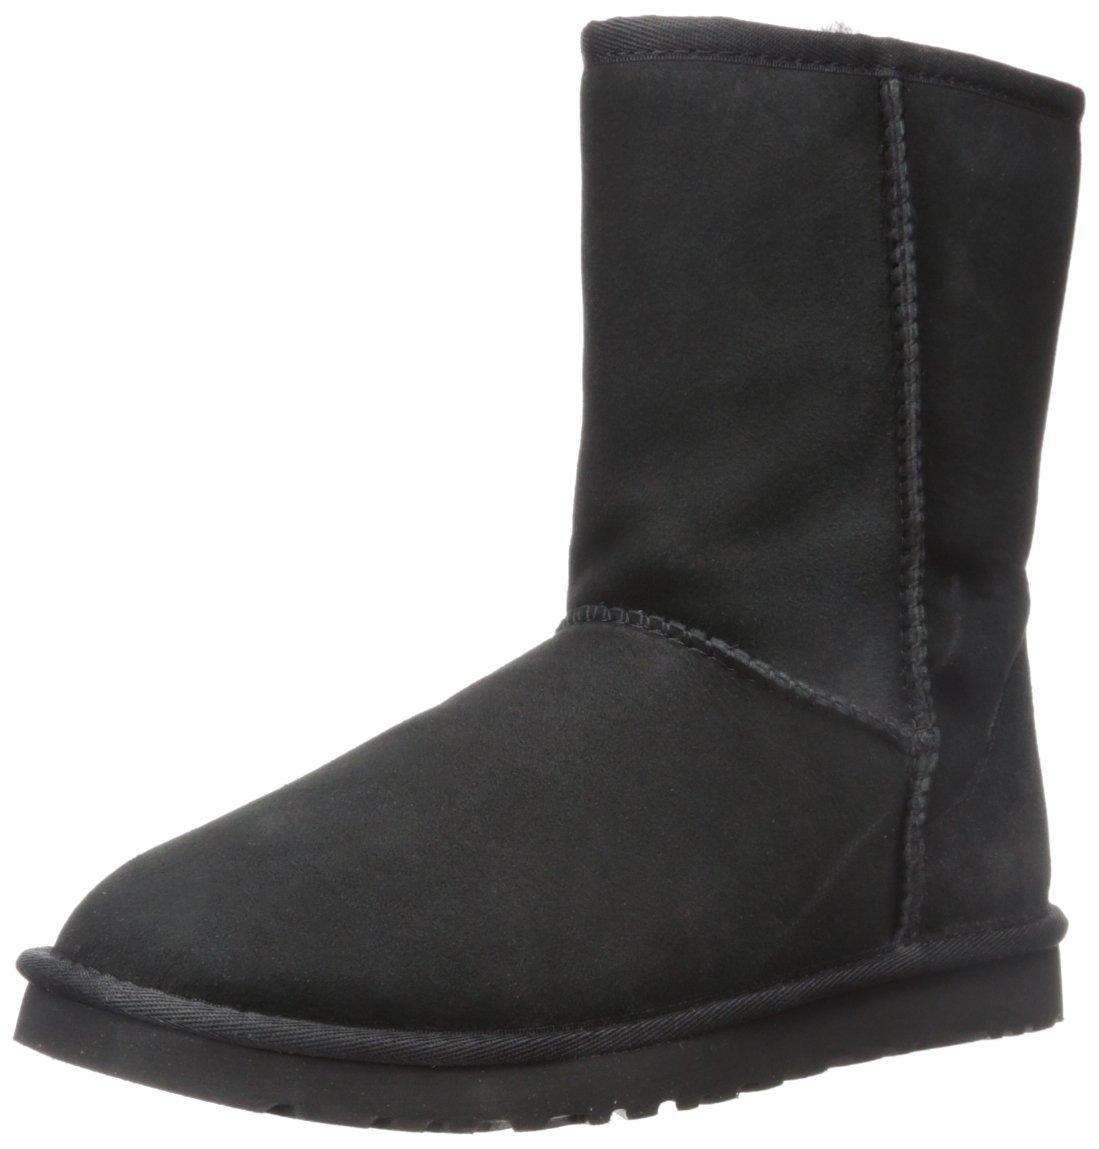 UGG Men's Classic Short Sheepskin Boots, Black, 11 D(M) US by UGG